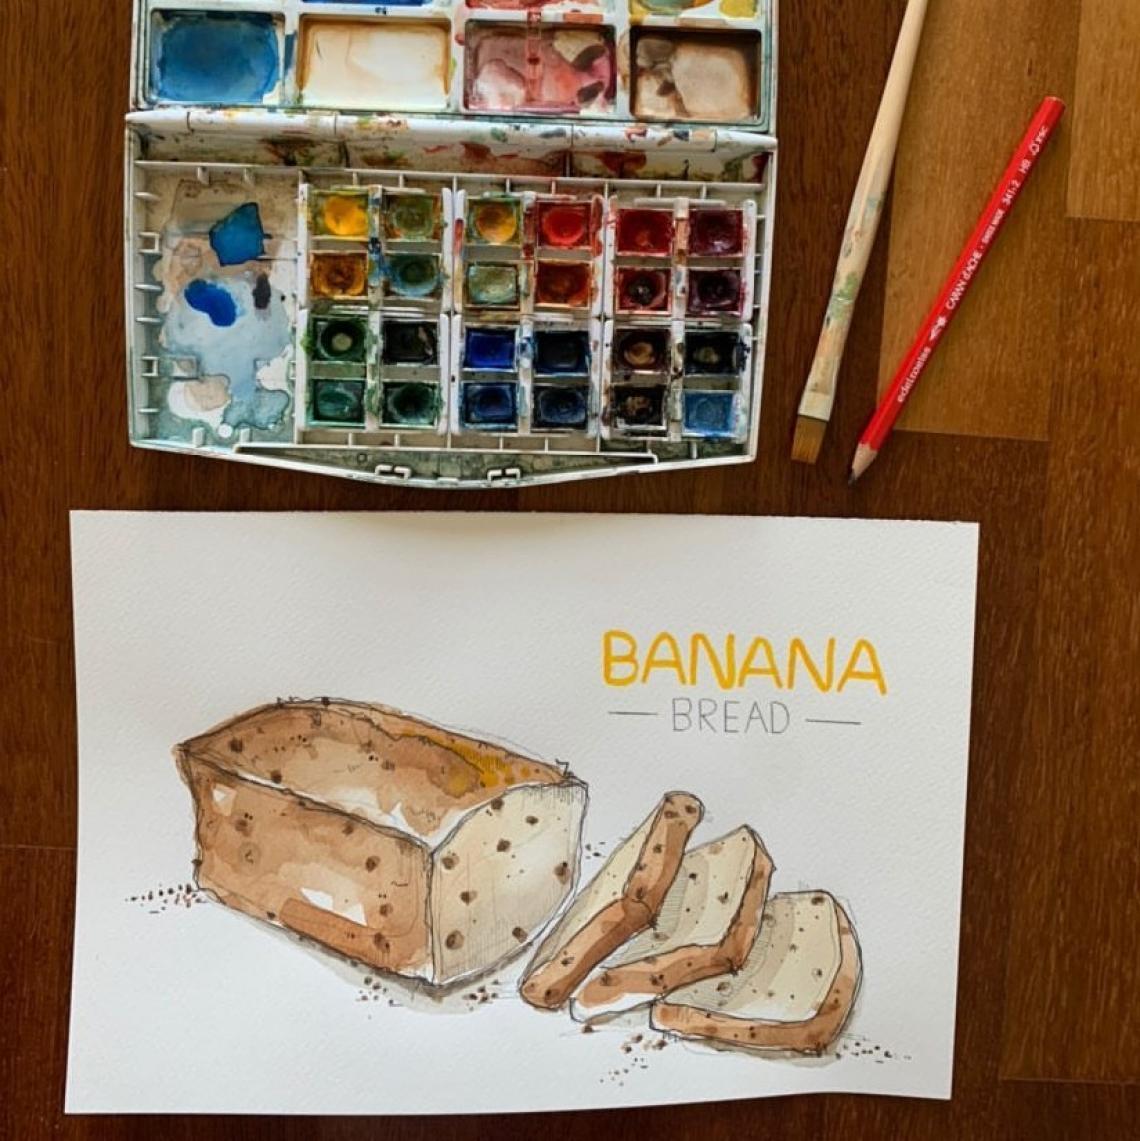 Banana bread by Marco Scanziani